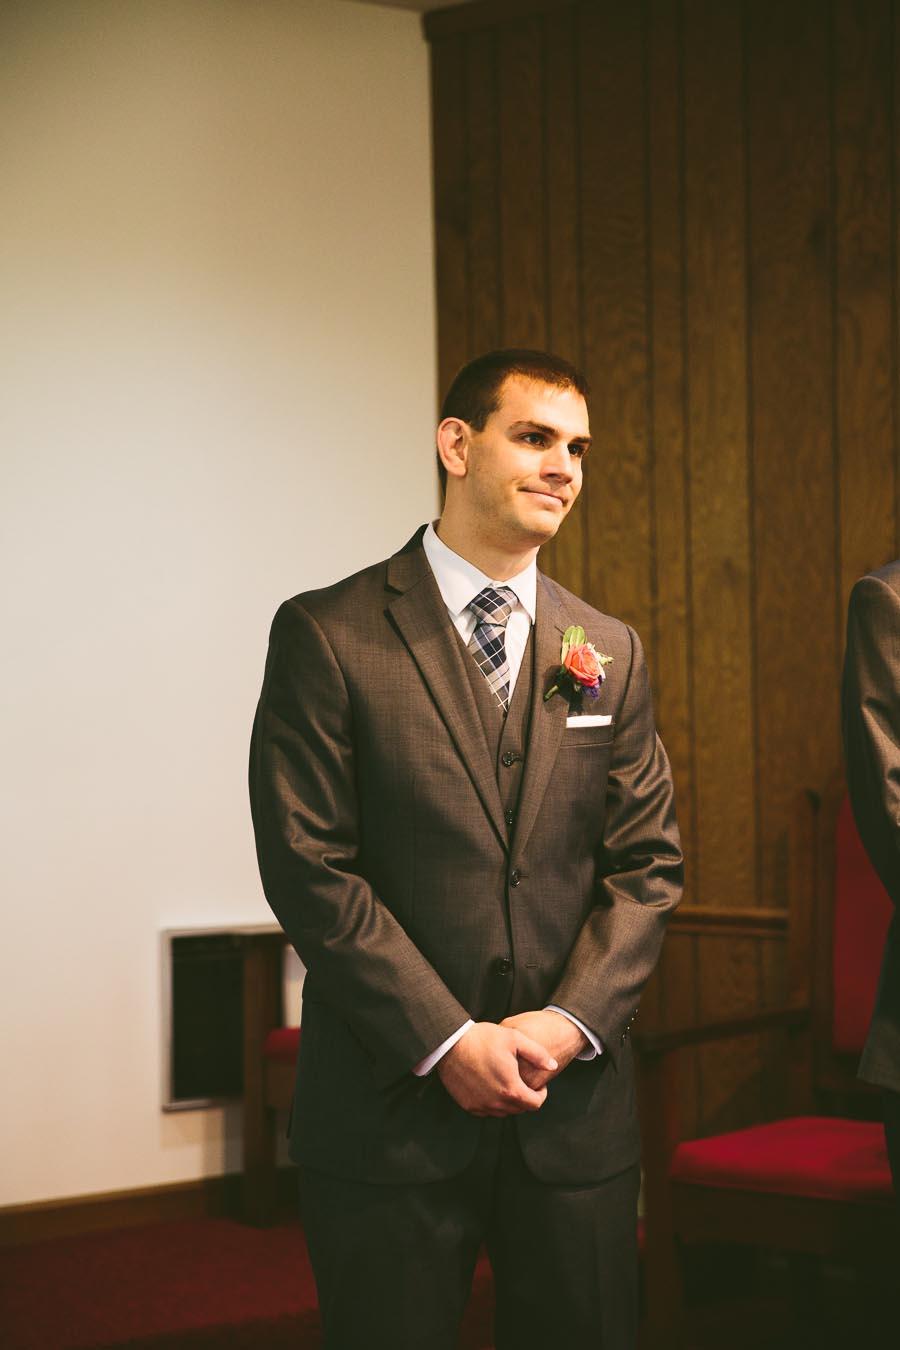 columbus-delaware-ohio-wedding-photography-all-occasions-74.jpg